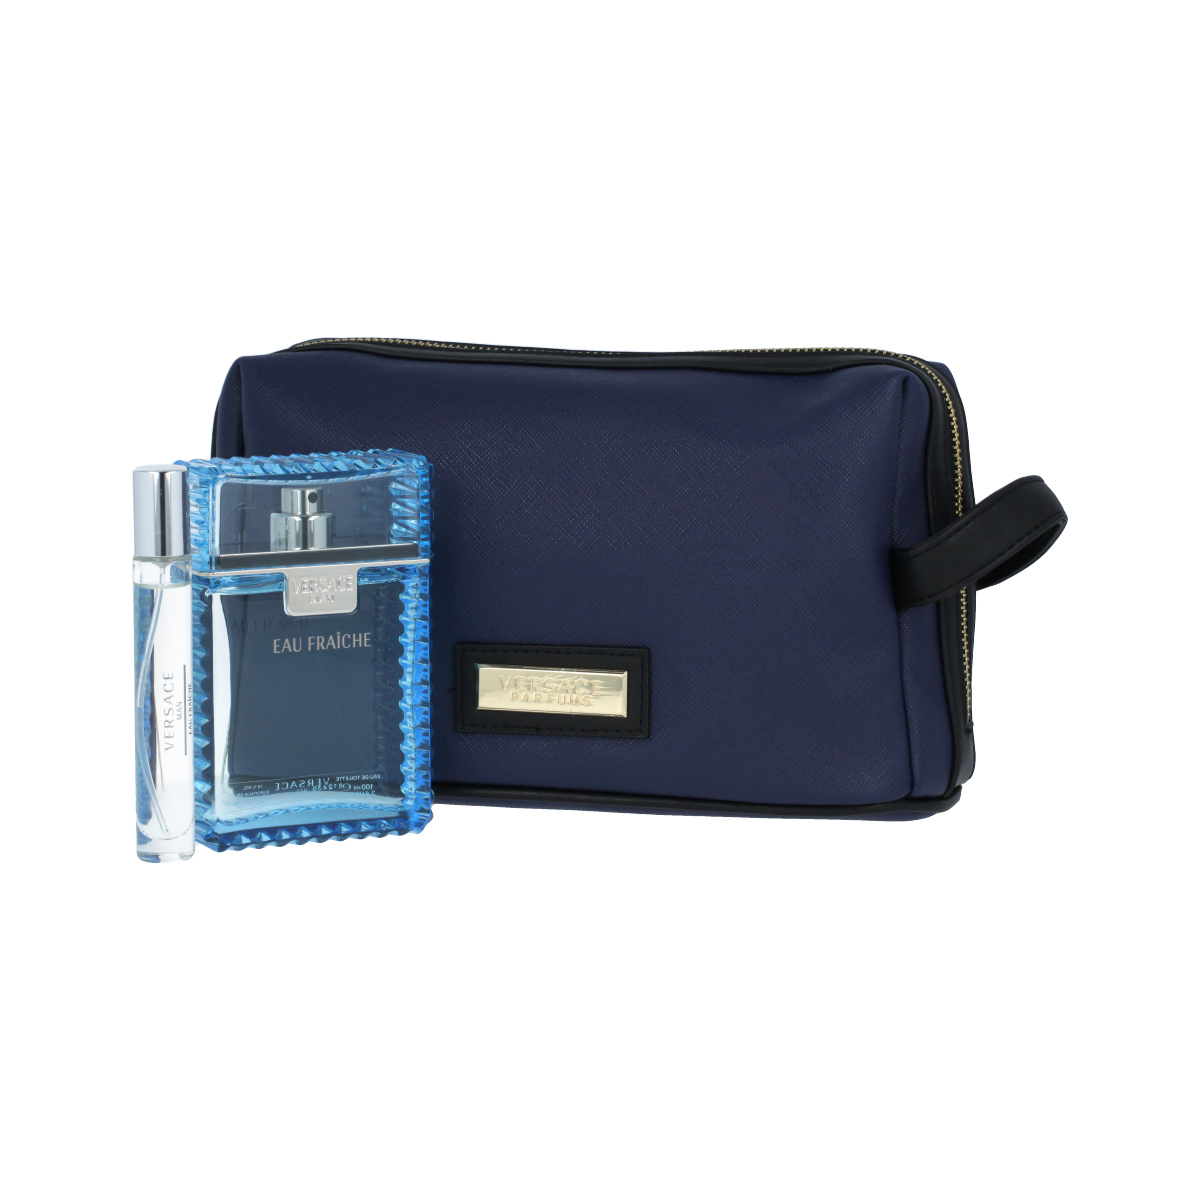 Versace Man Eau Fraîche EDT 100 ml + EDT MINI 10 ml + kosmetická taška M